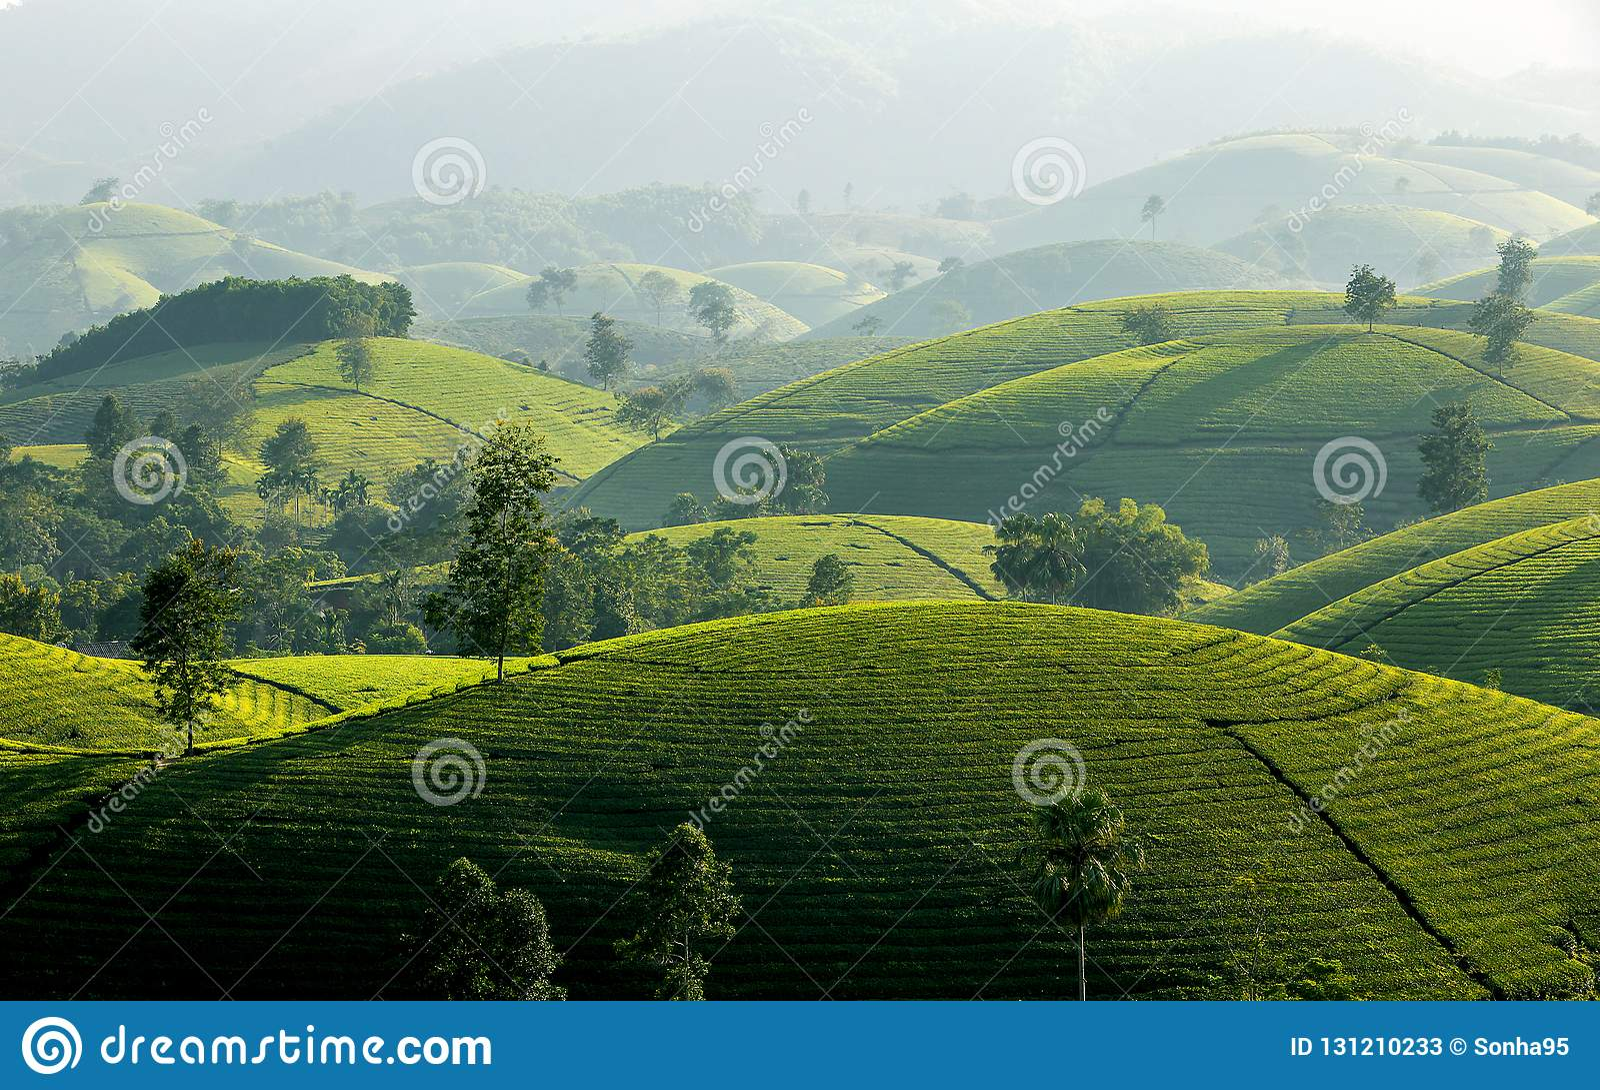 Tea hills in Long Coc highland